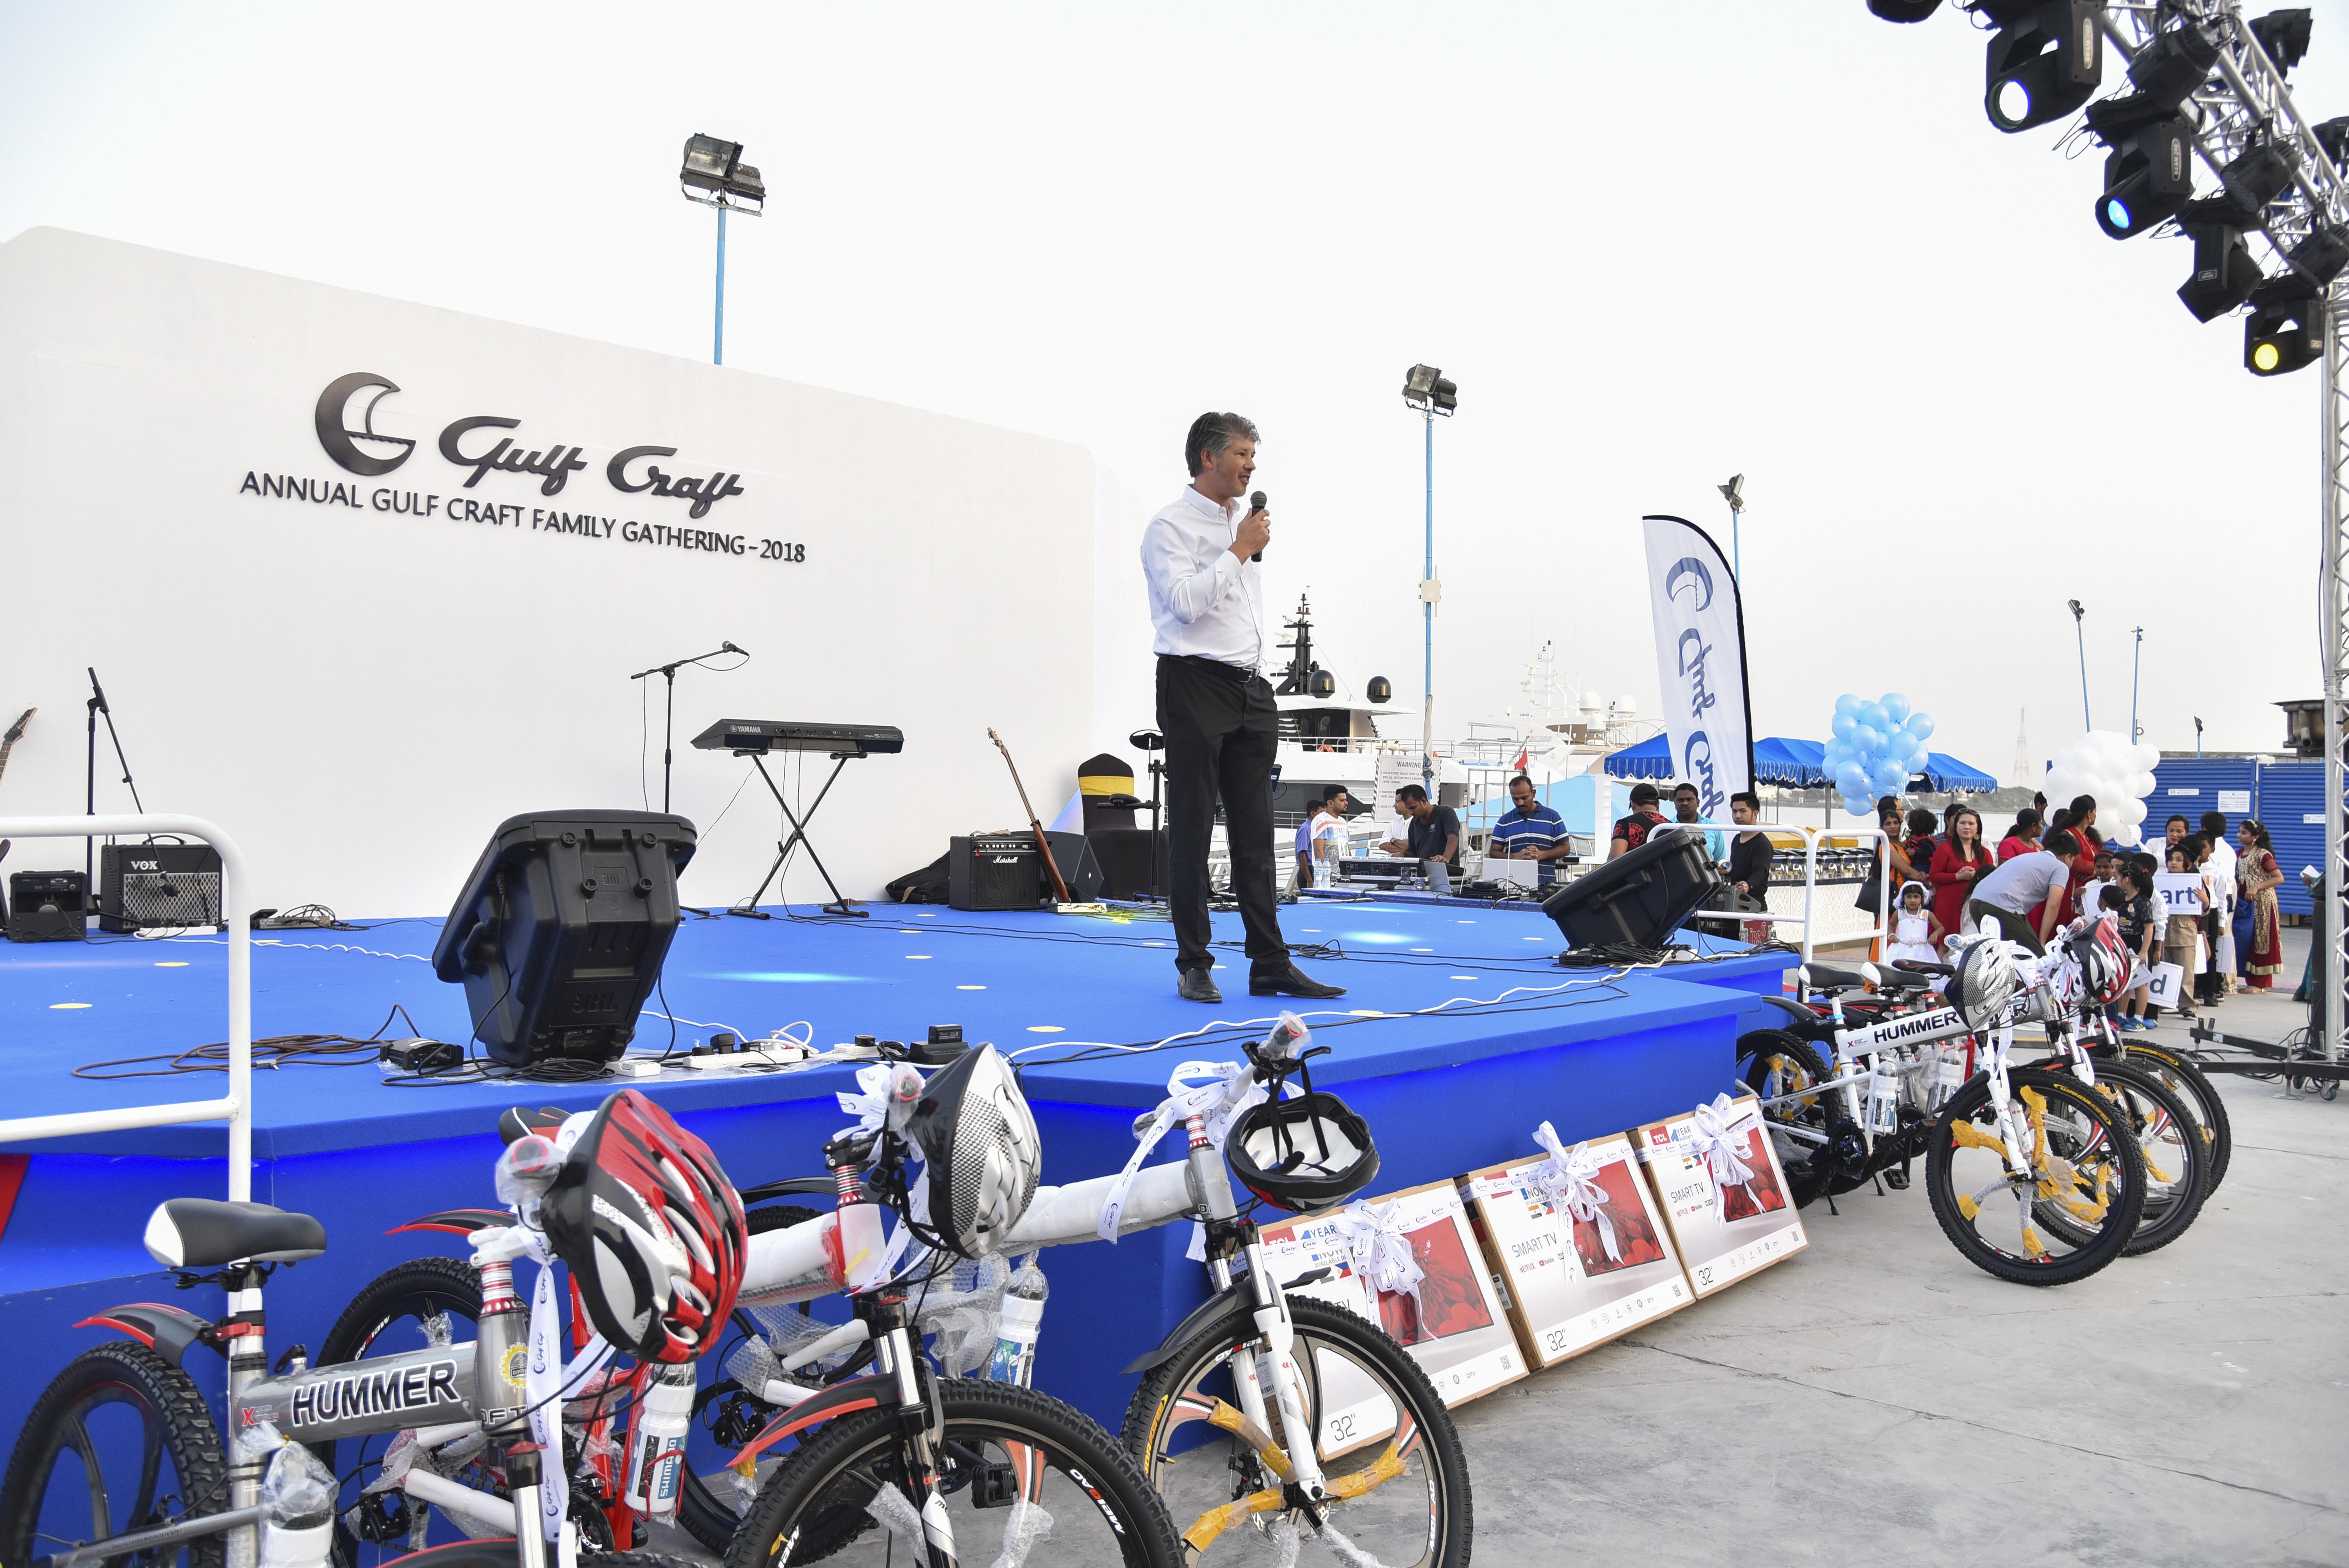 Gulf Craft's Annual Family Gathering 2018 (21).jpg